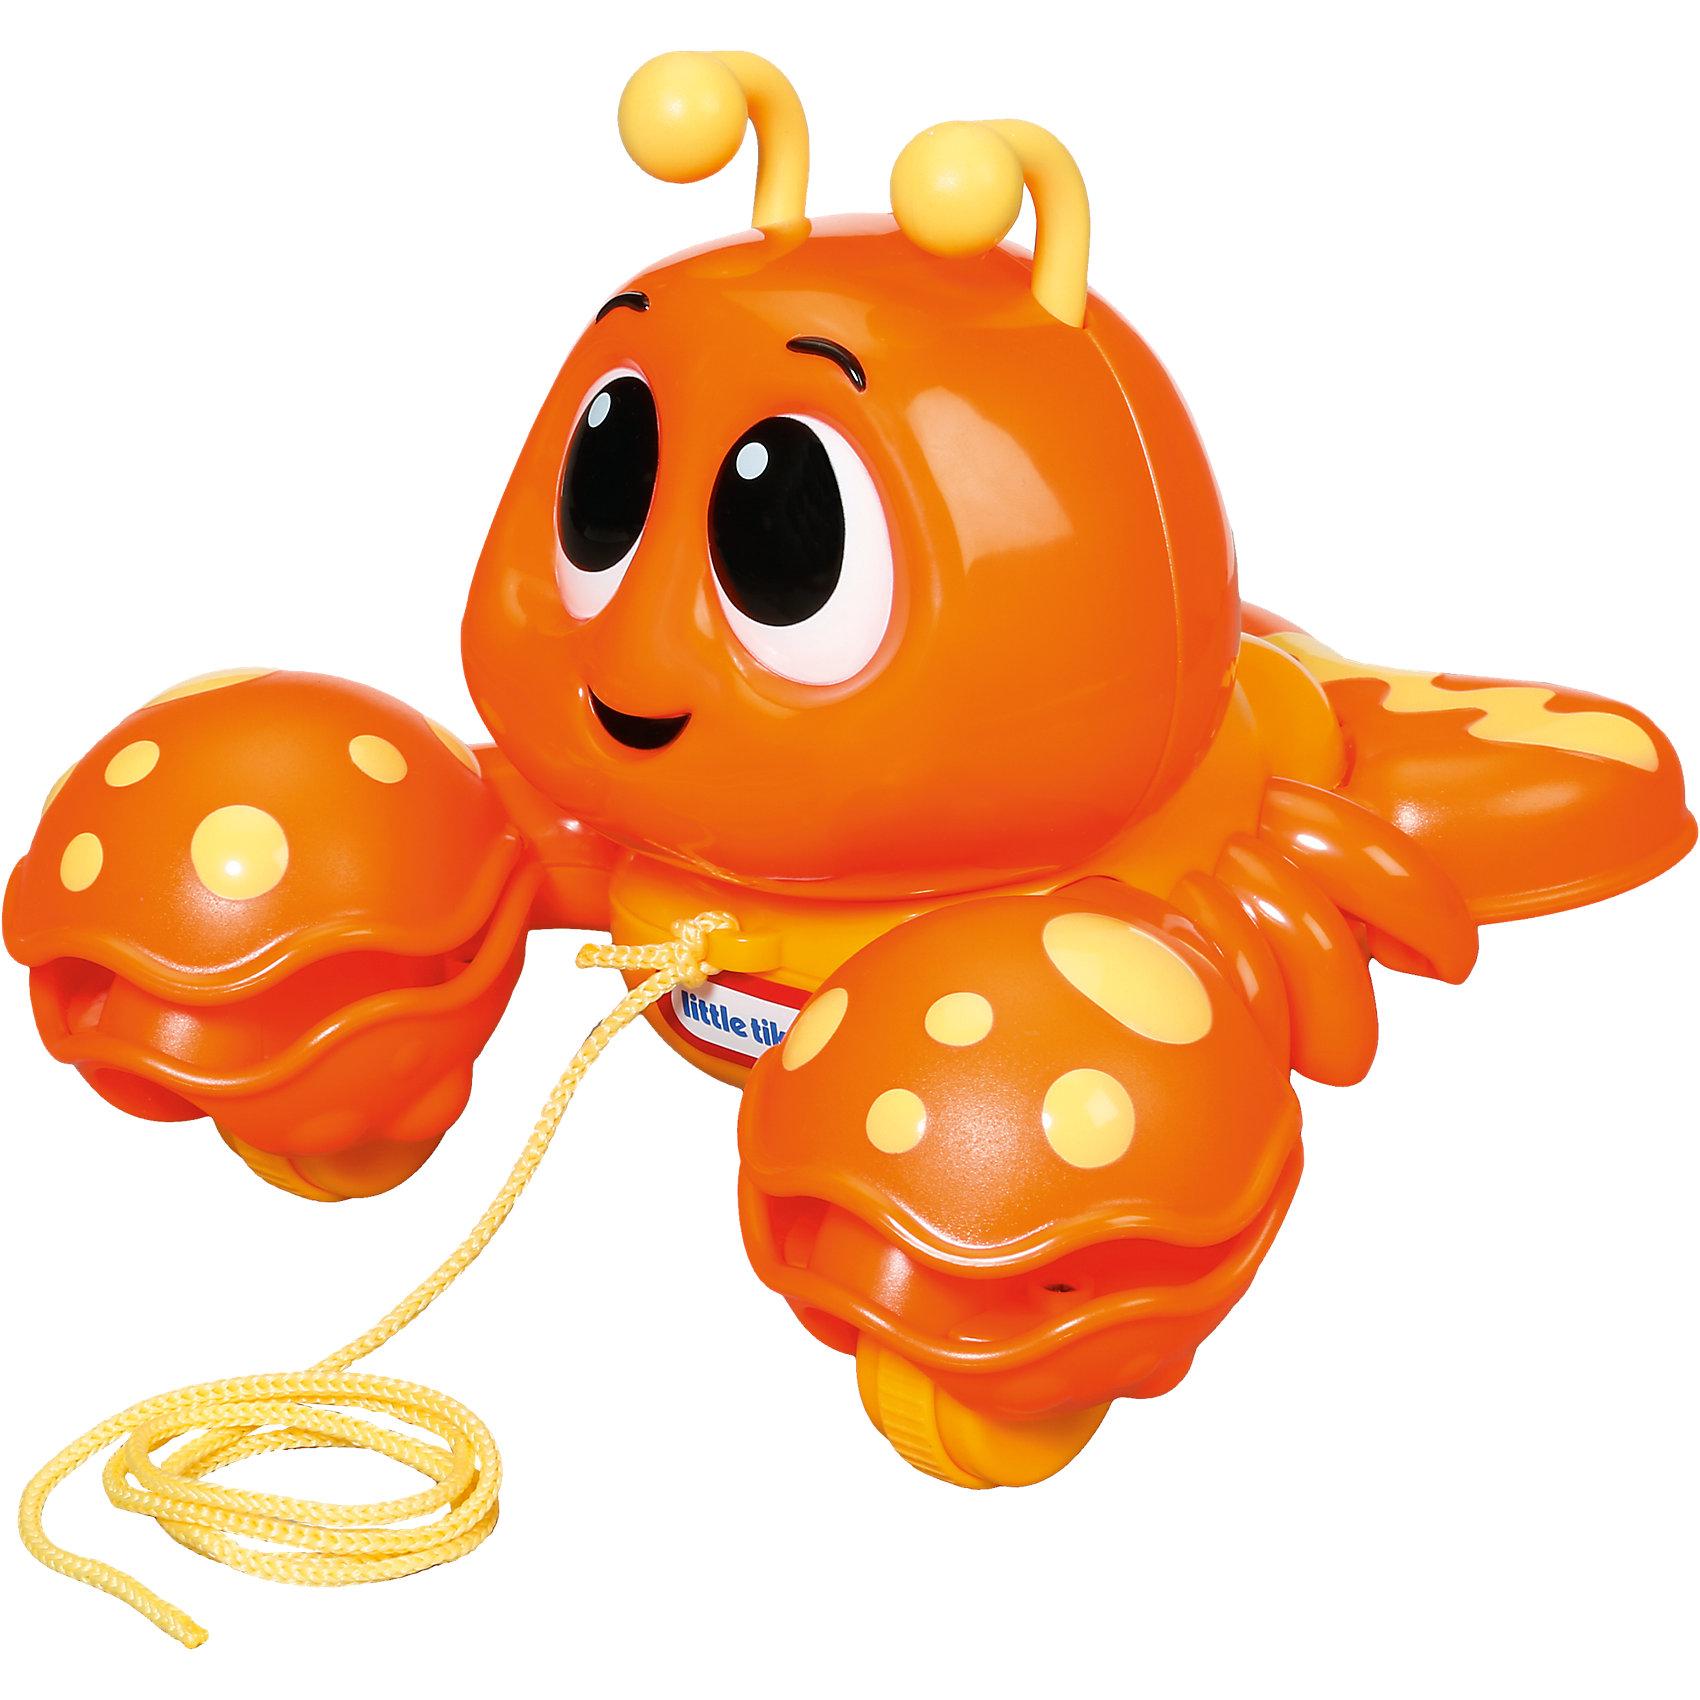 Little Tikes Развивающая игрушка Клацающий лобстер на веревочке, Little Tikes игрушка развивающая little tikes морская звезда page 2